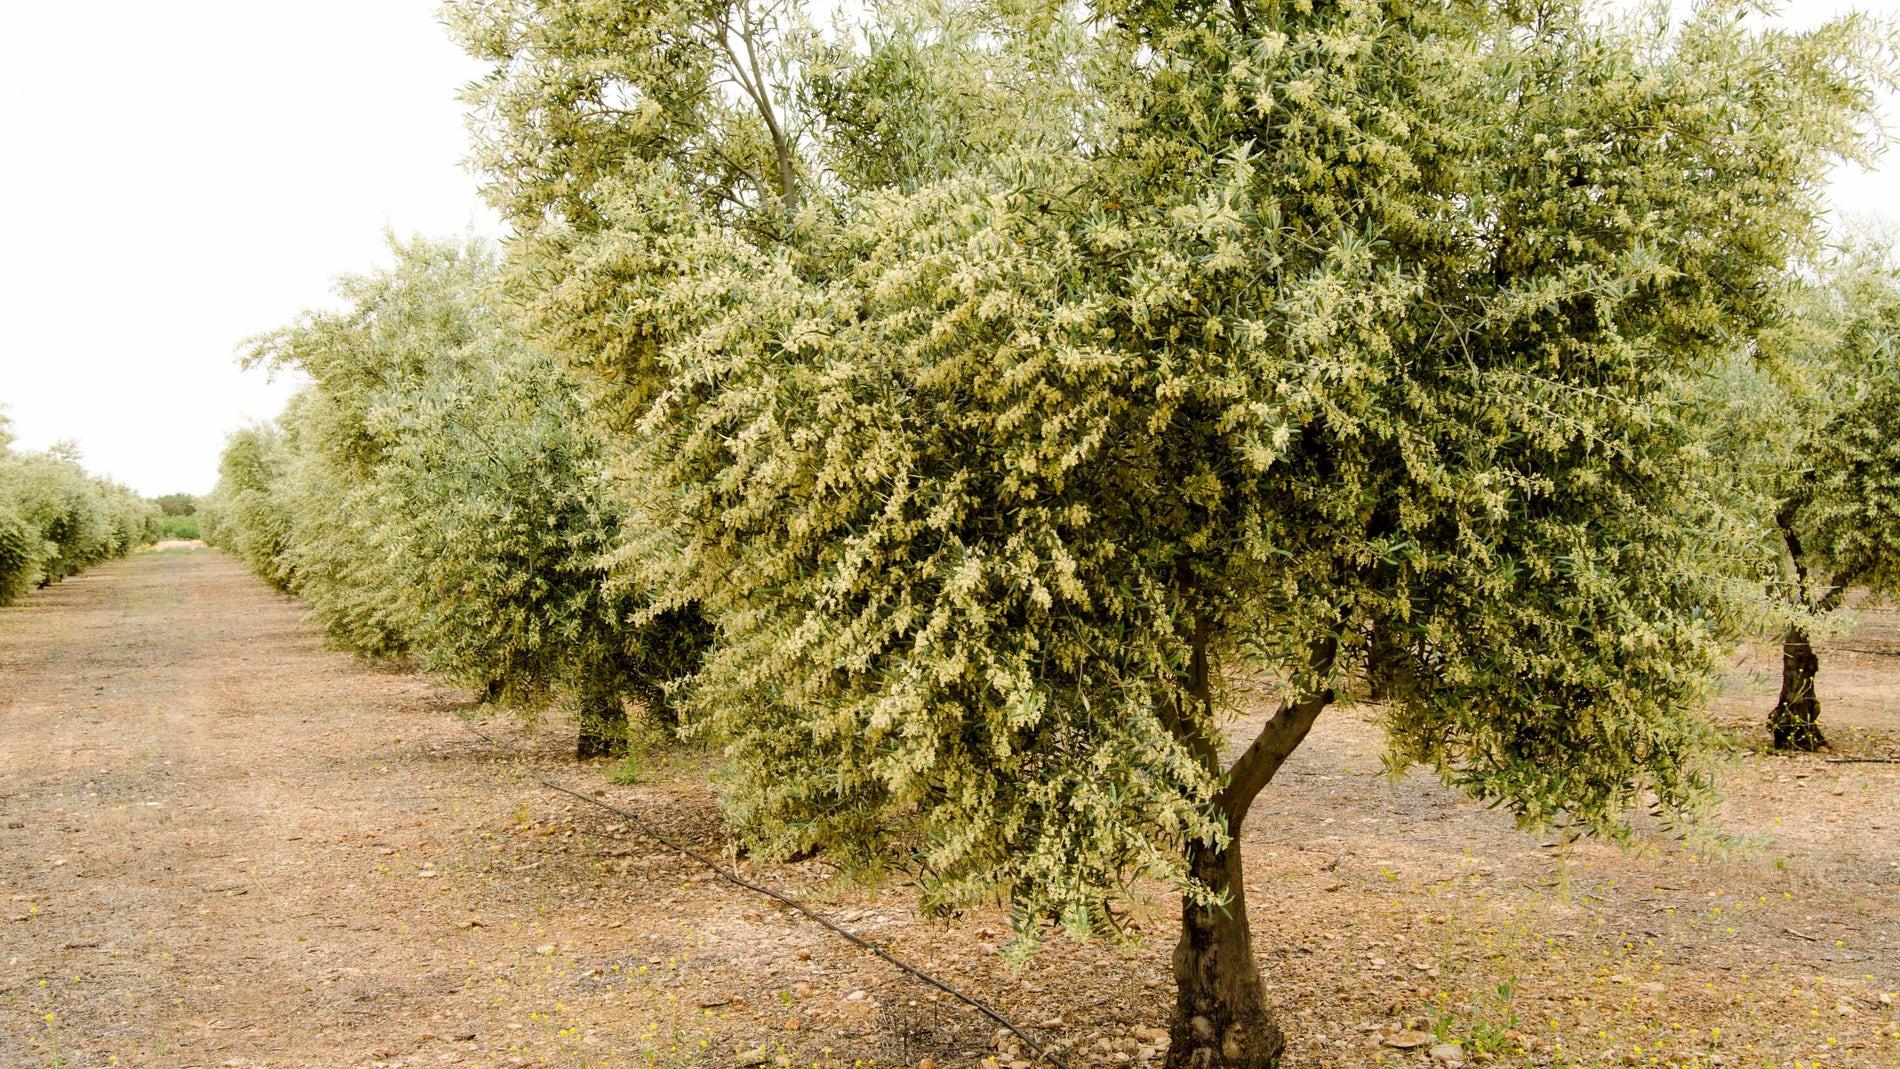 Olivar de la variedad Cornicabra en plen